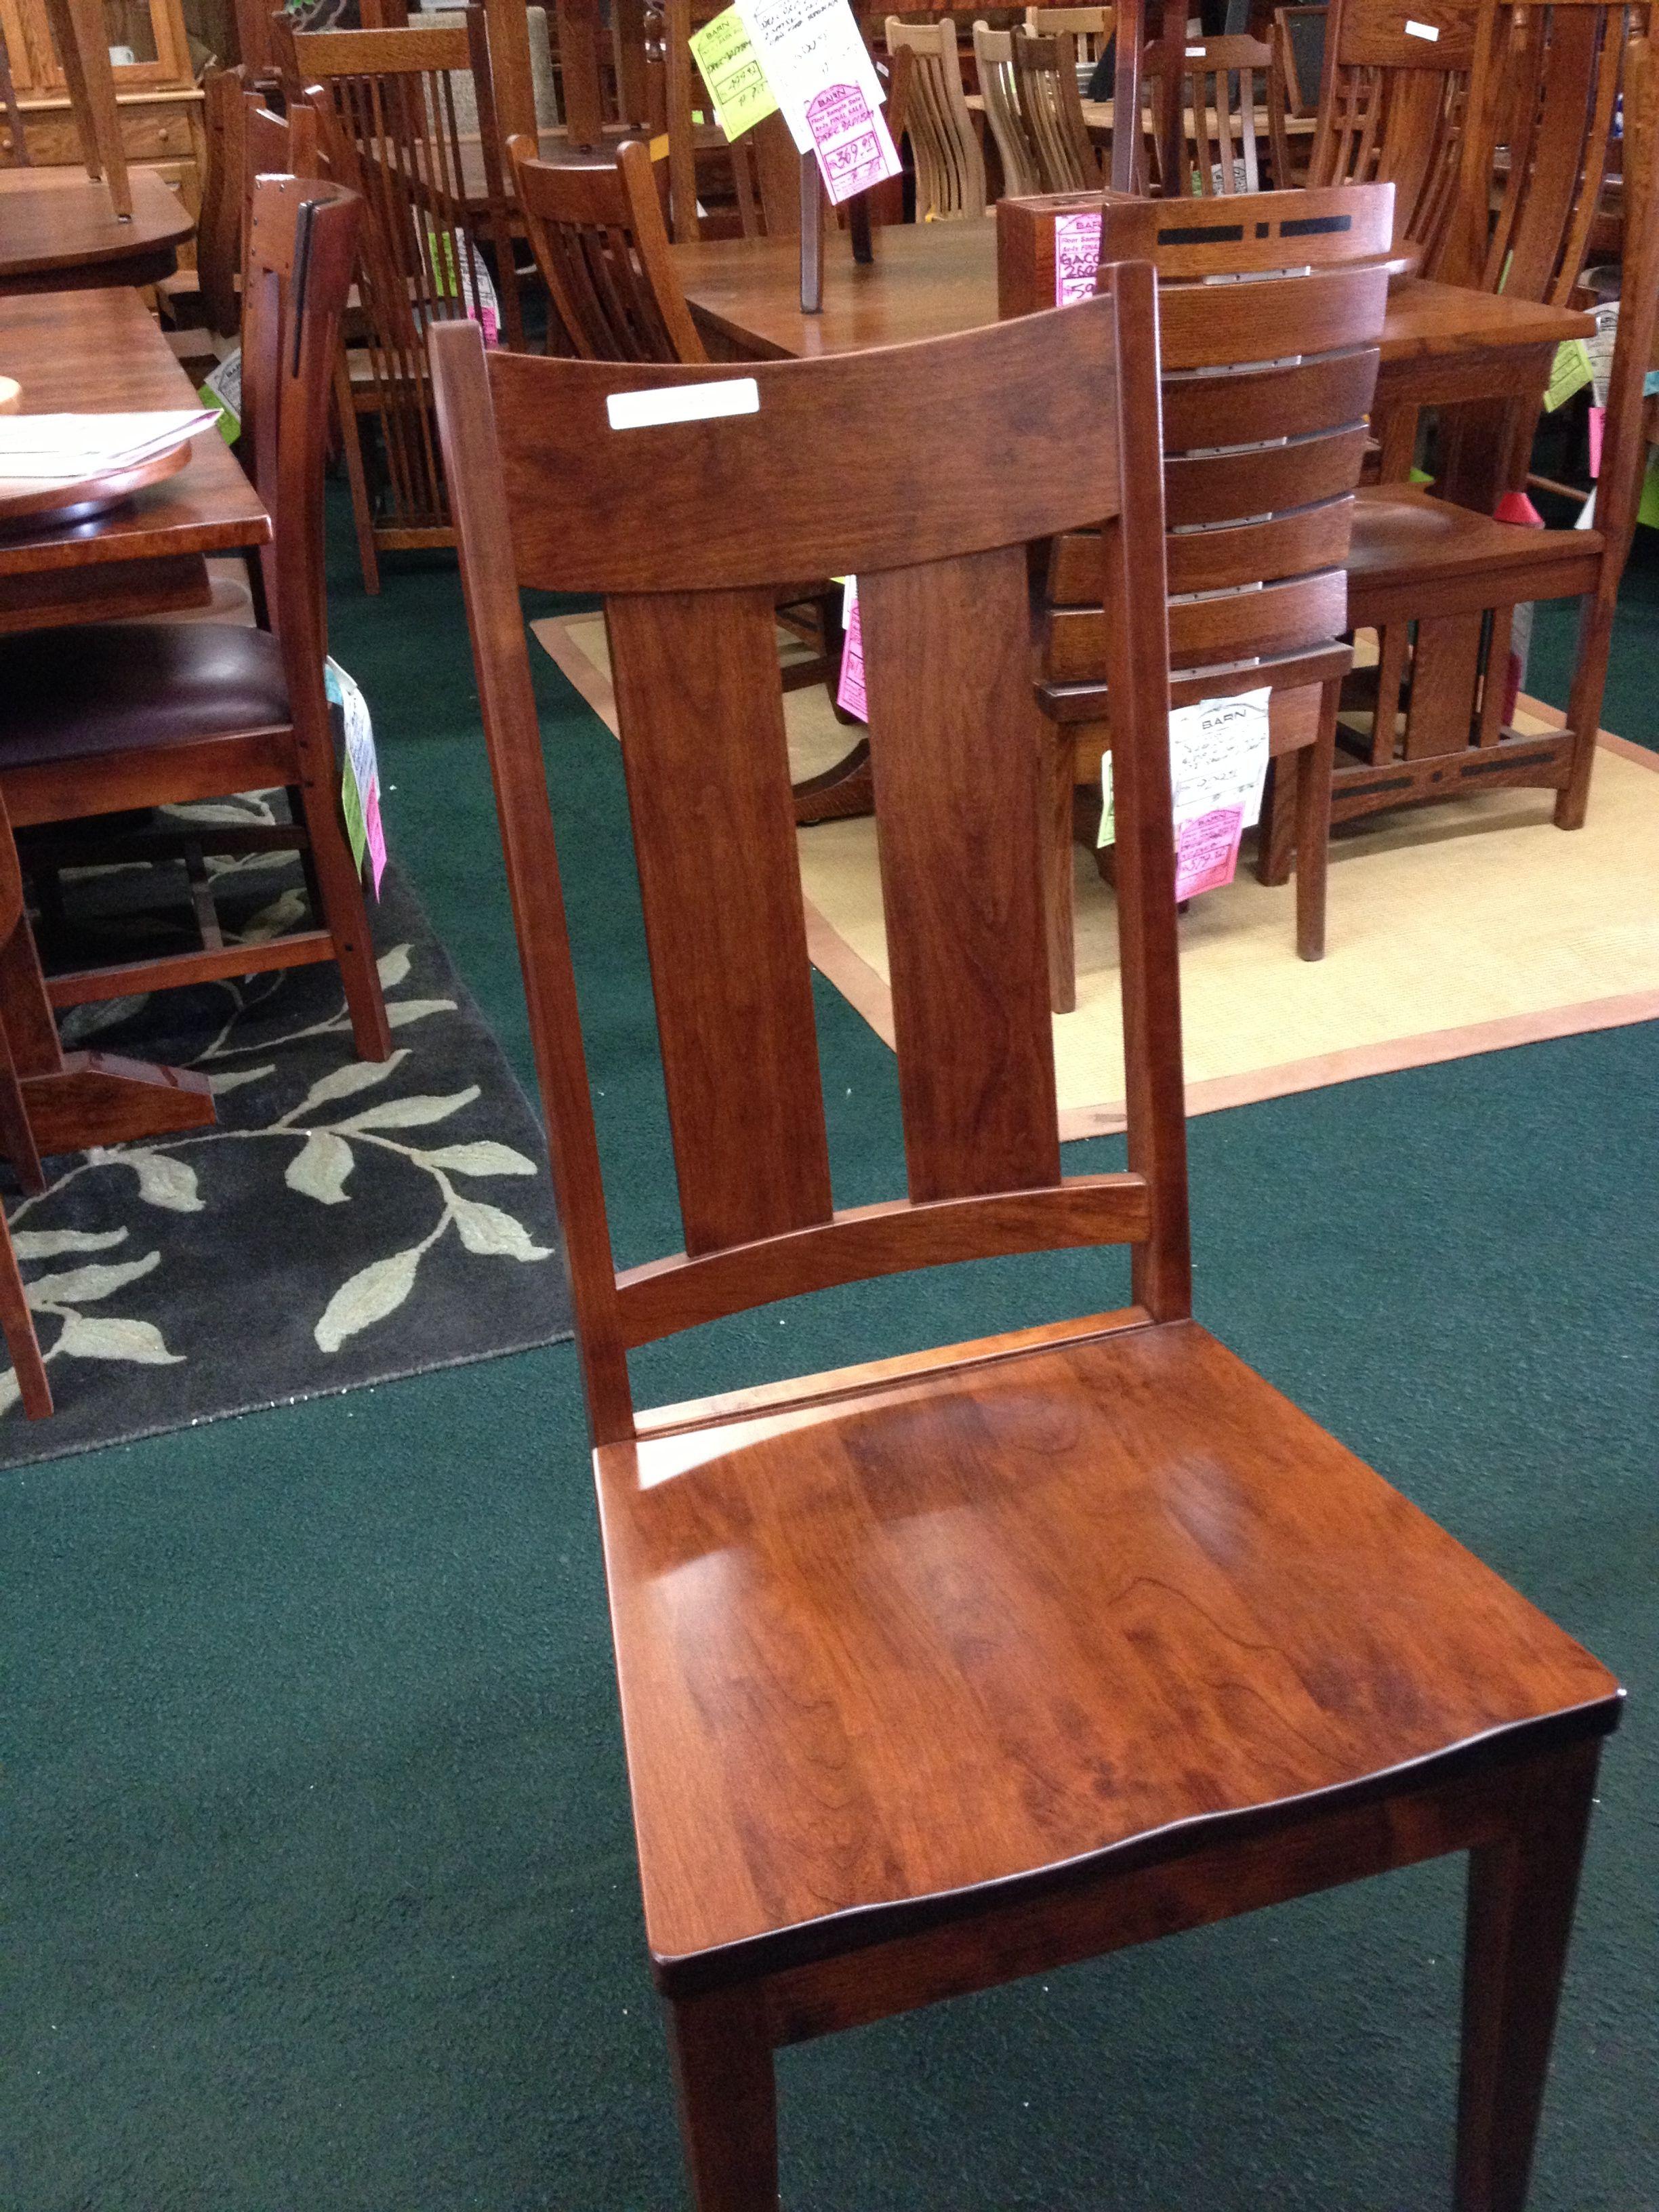 My Chairs But Dark Walnut Stain Quarter Sawn Oak Van Nuys Barn Furniture.  Super Comfortable